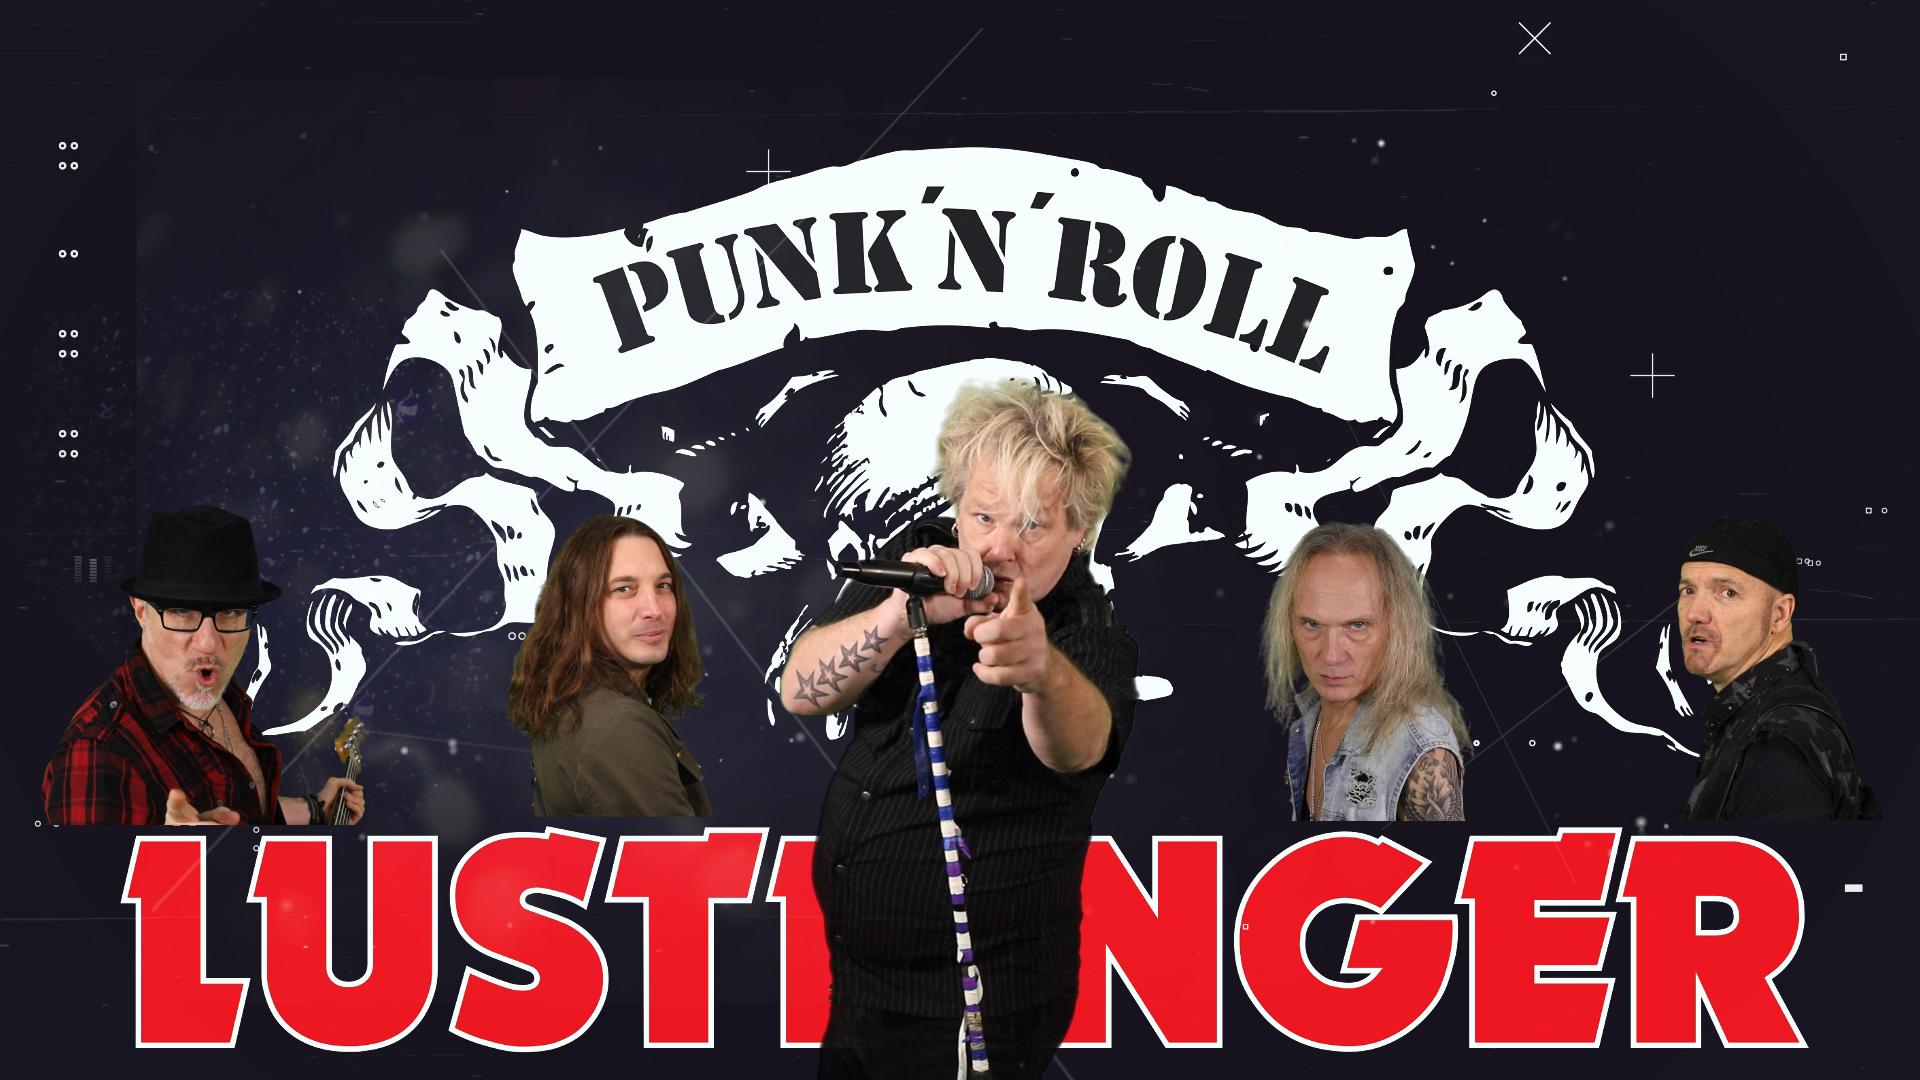 Lustfinger, Punkband